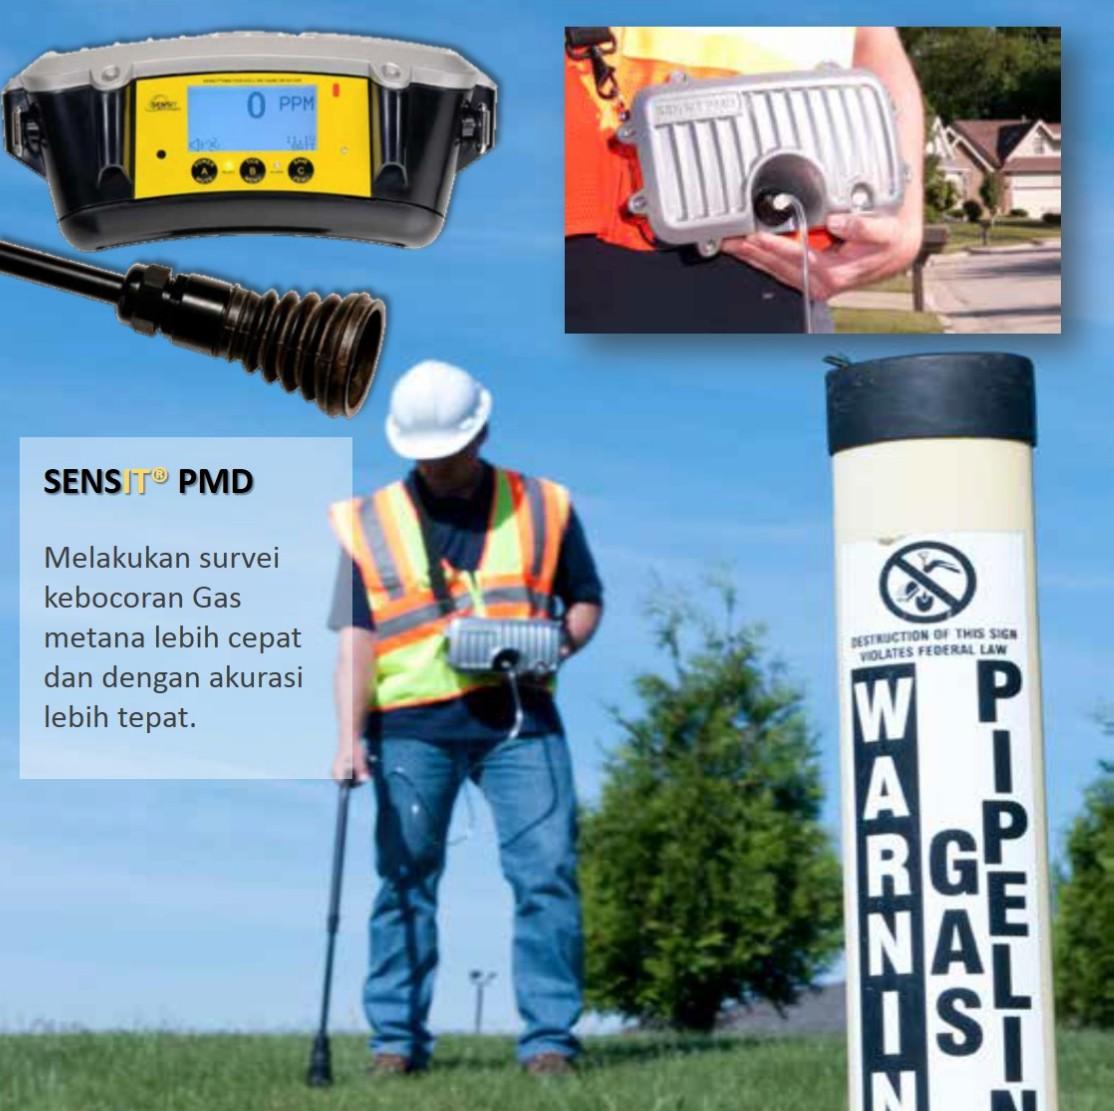 Portable Methane Detector – Sensit Type PMD